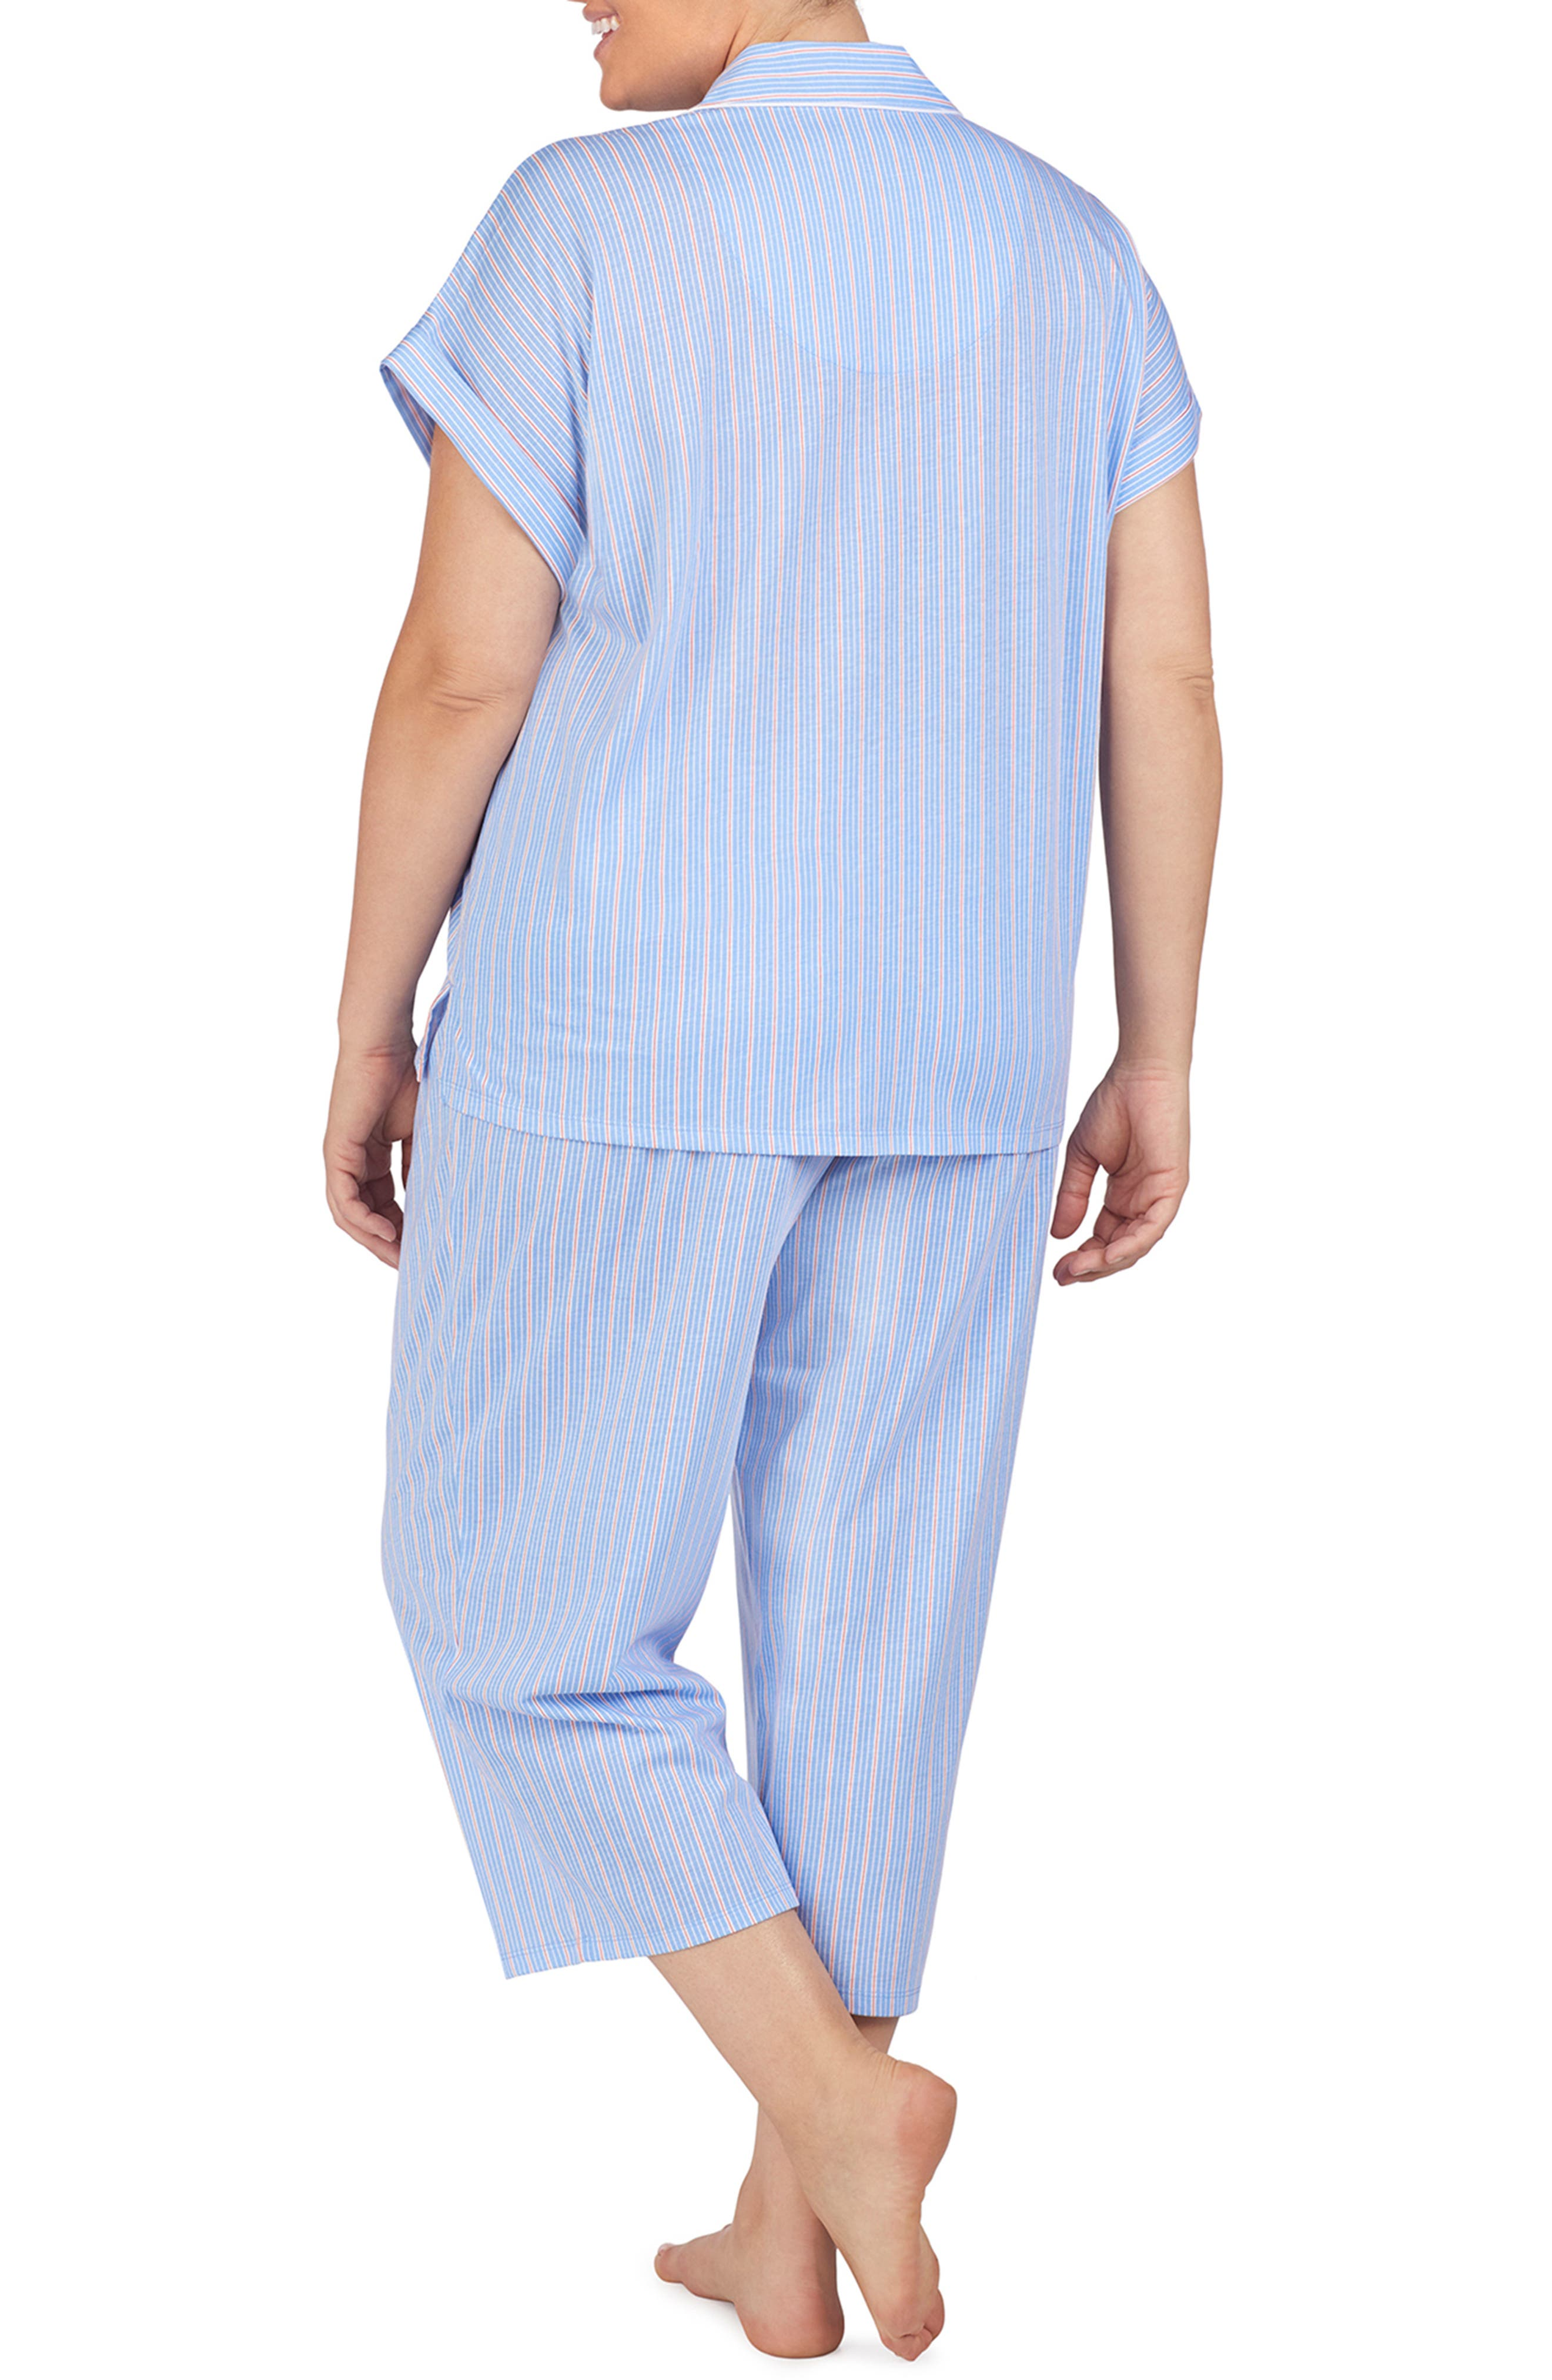 LAUREN RALPH LAUREN, Capri Pajamas, Alternate thumbnail 4, color, BLUE STRIPE